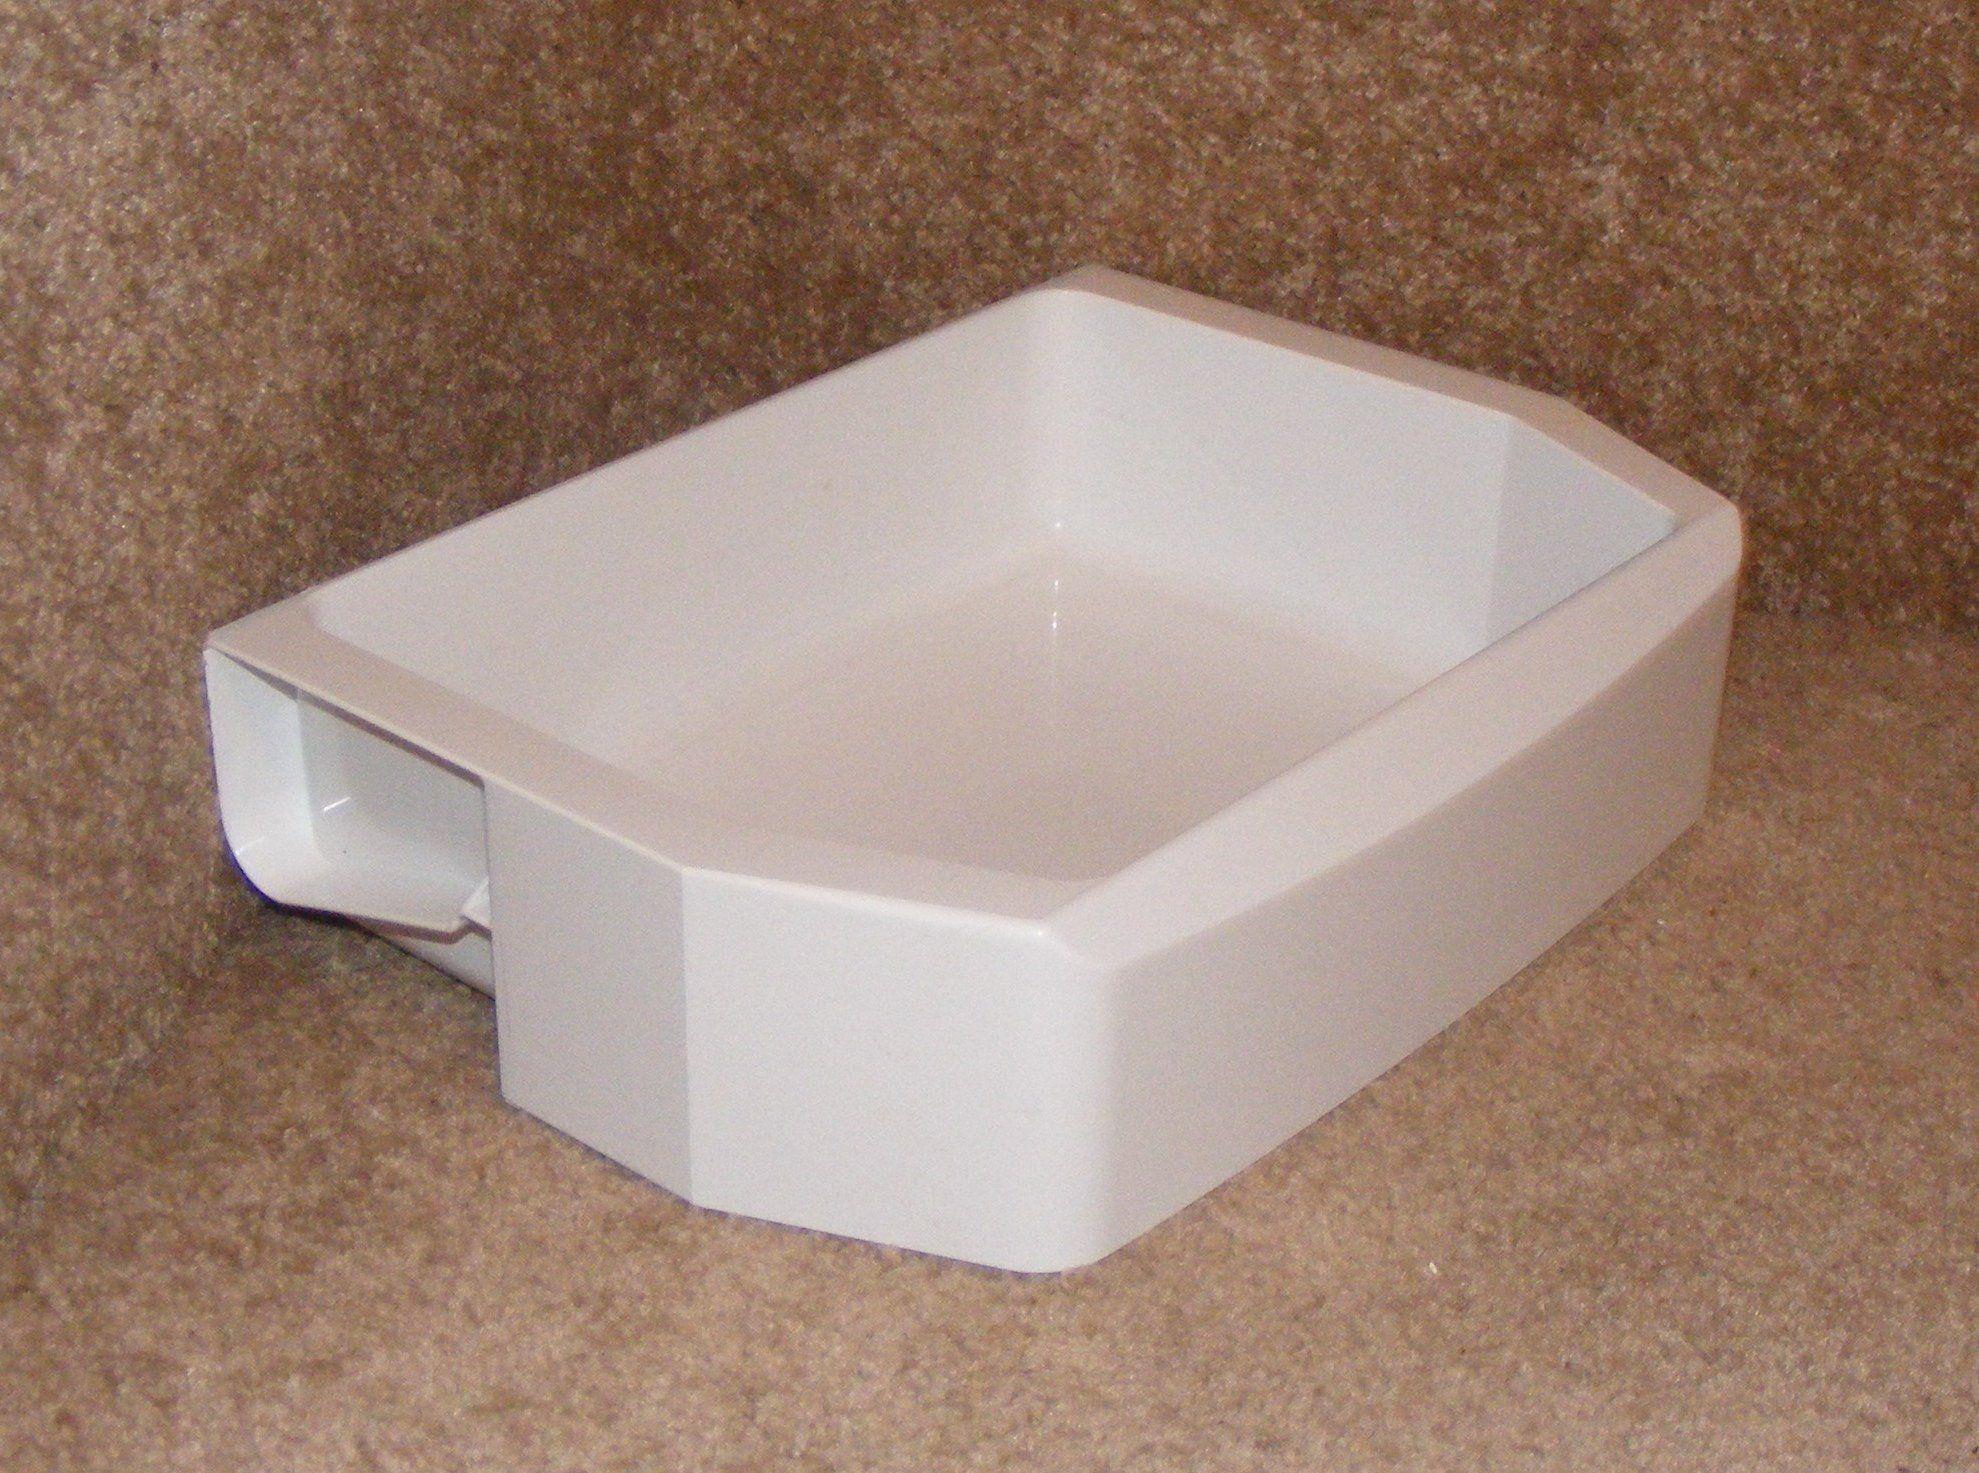 2171064 kitchen aid whirlpool refrigerator door bin